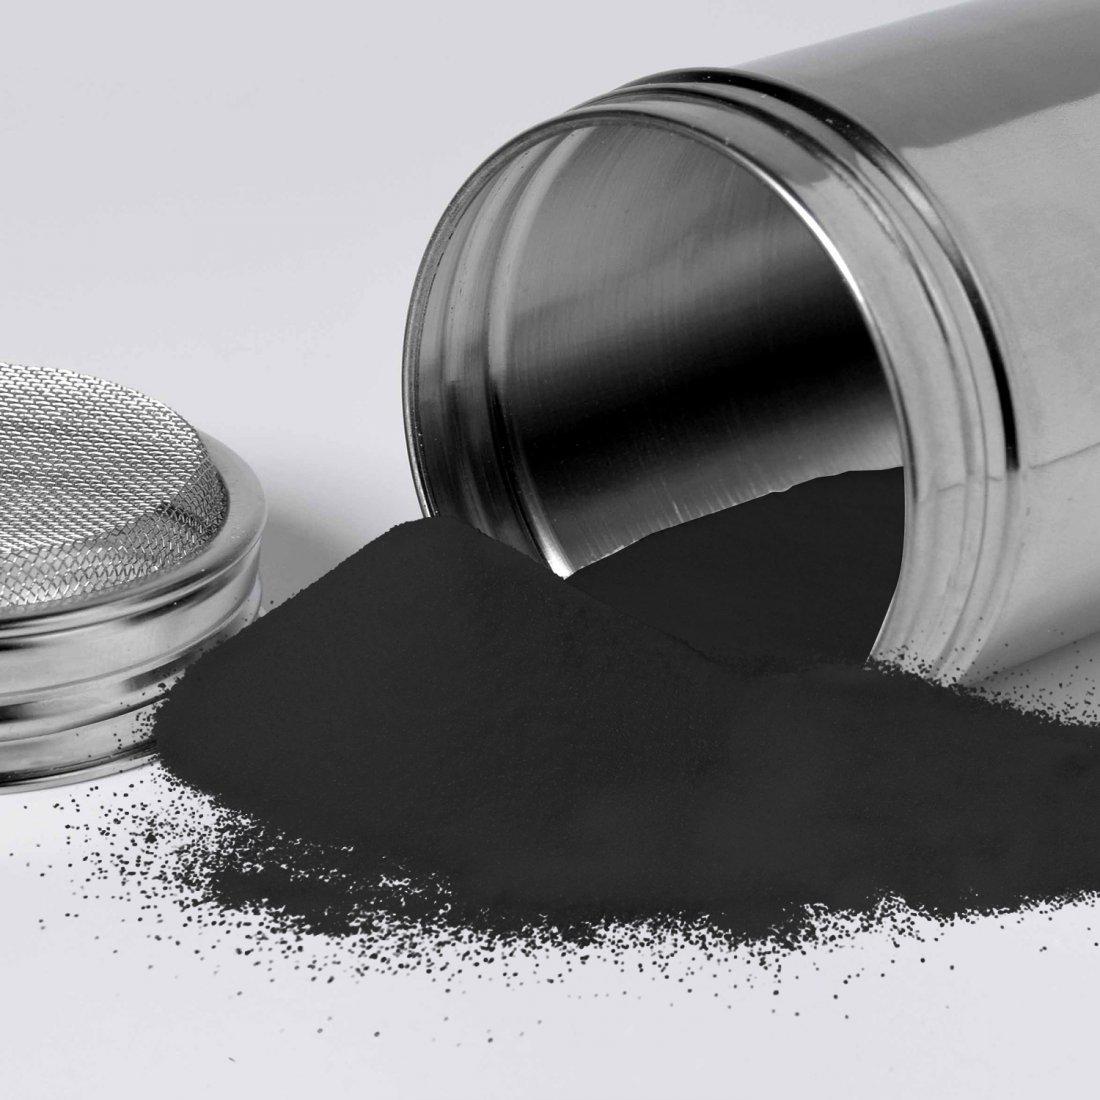 Hauptbild von ColorMatch DTF PowderGlue Black - Transferkleber